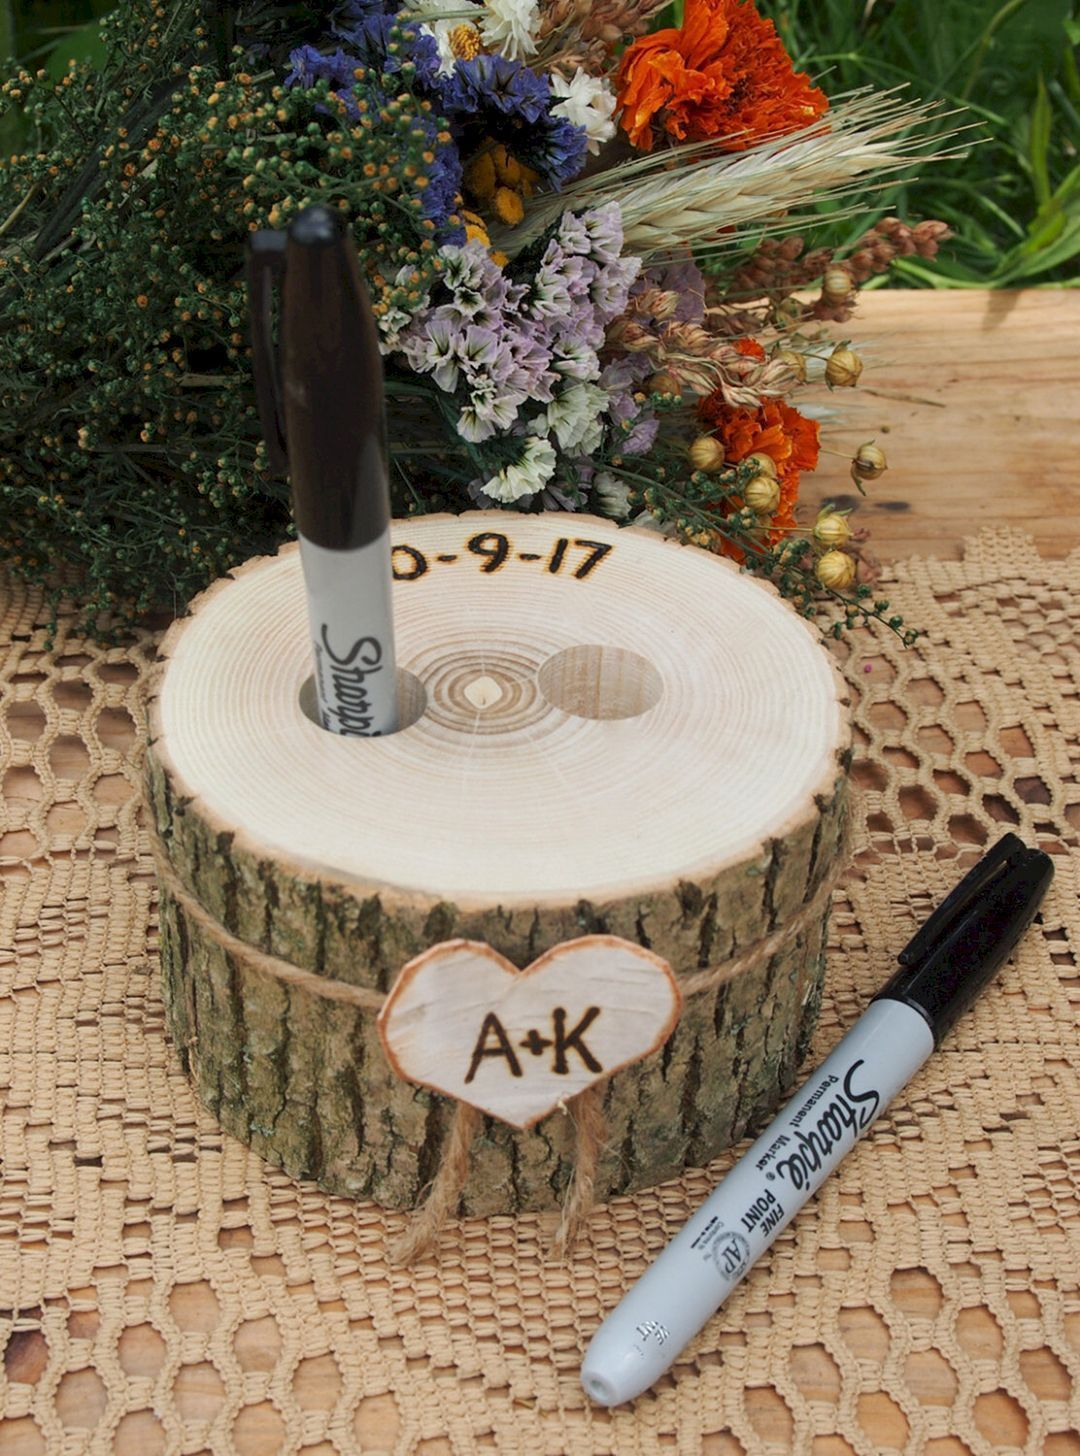 Wooden wedding decor ideas   DIY Creative Rustic Chic Wedding Centerpieces Ideas  Graduation